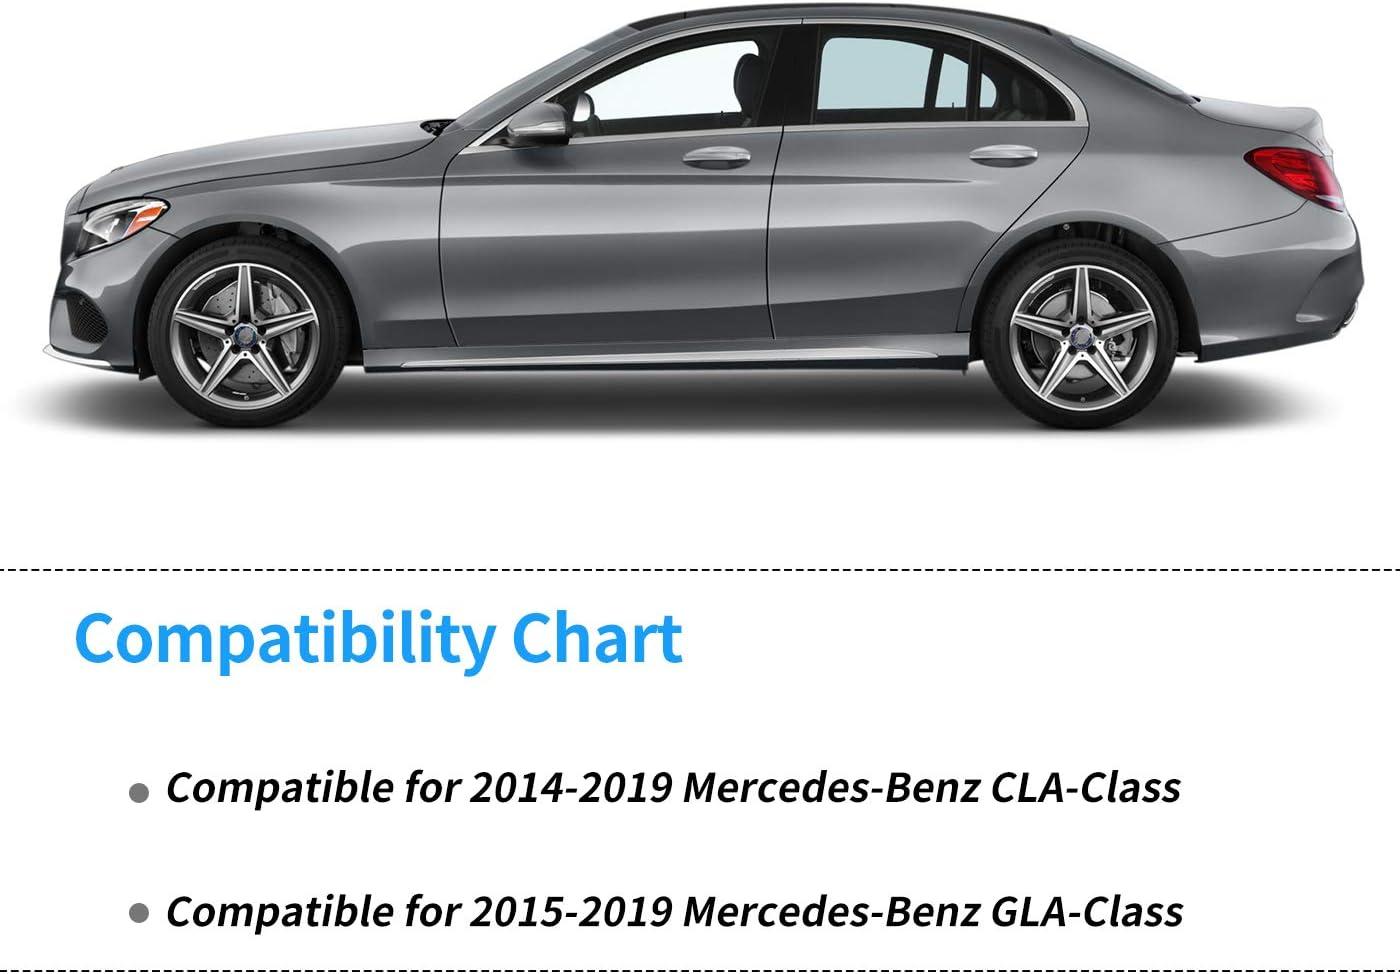 SMARTLINER Custom Fit Floor Mats 2 Row Liner Set Black for 2014-2019 Mercedes Benz CLA 2015-2019 GLA